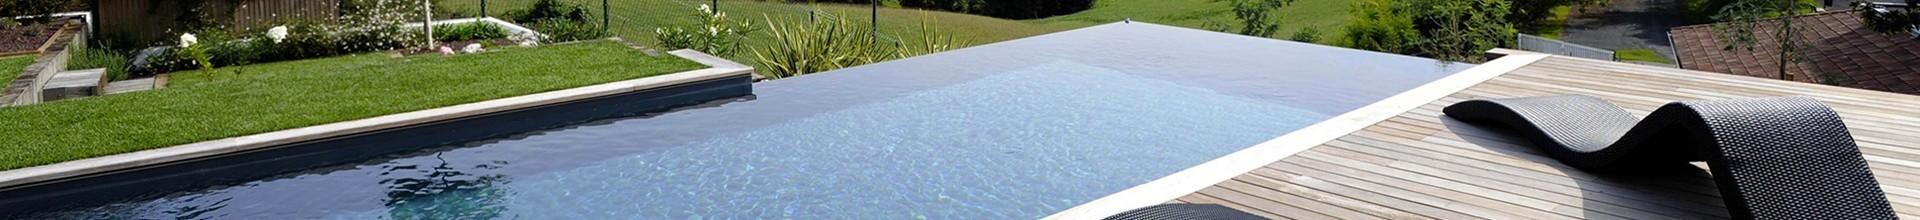 Direct usine, piscine coque prix Marne